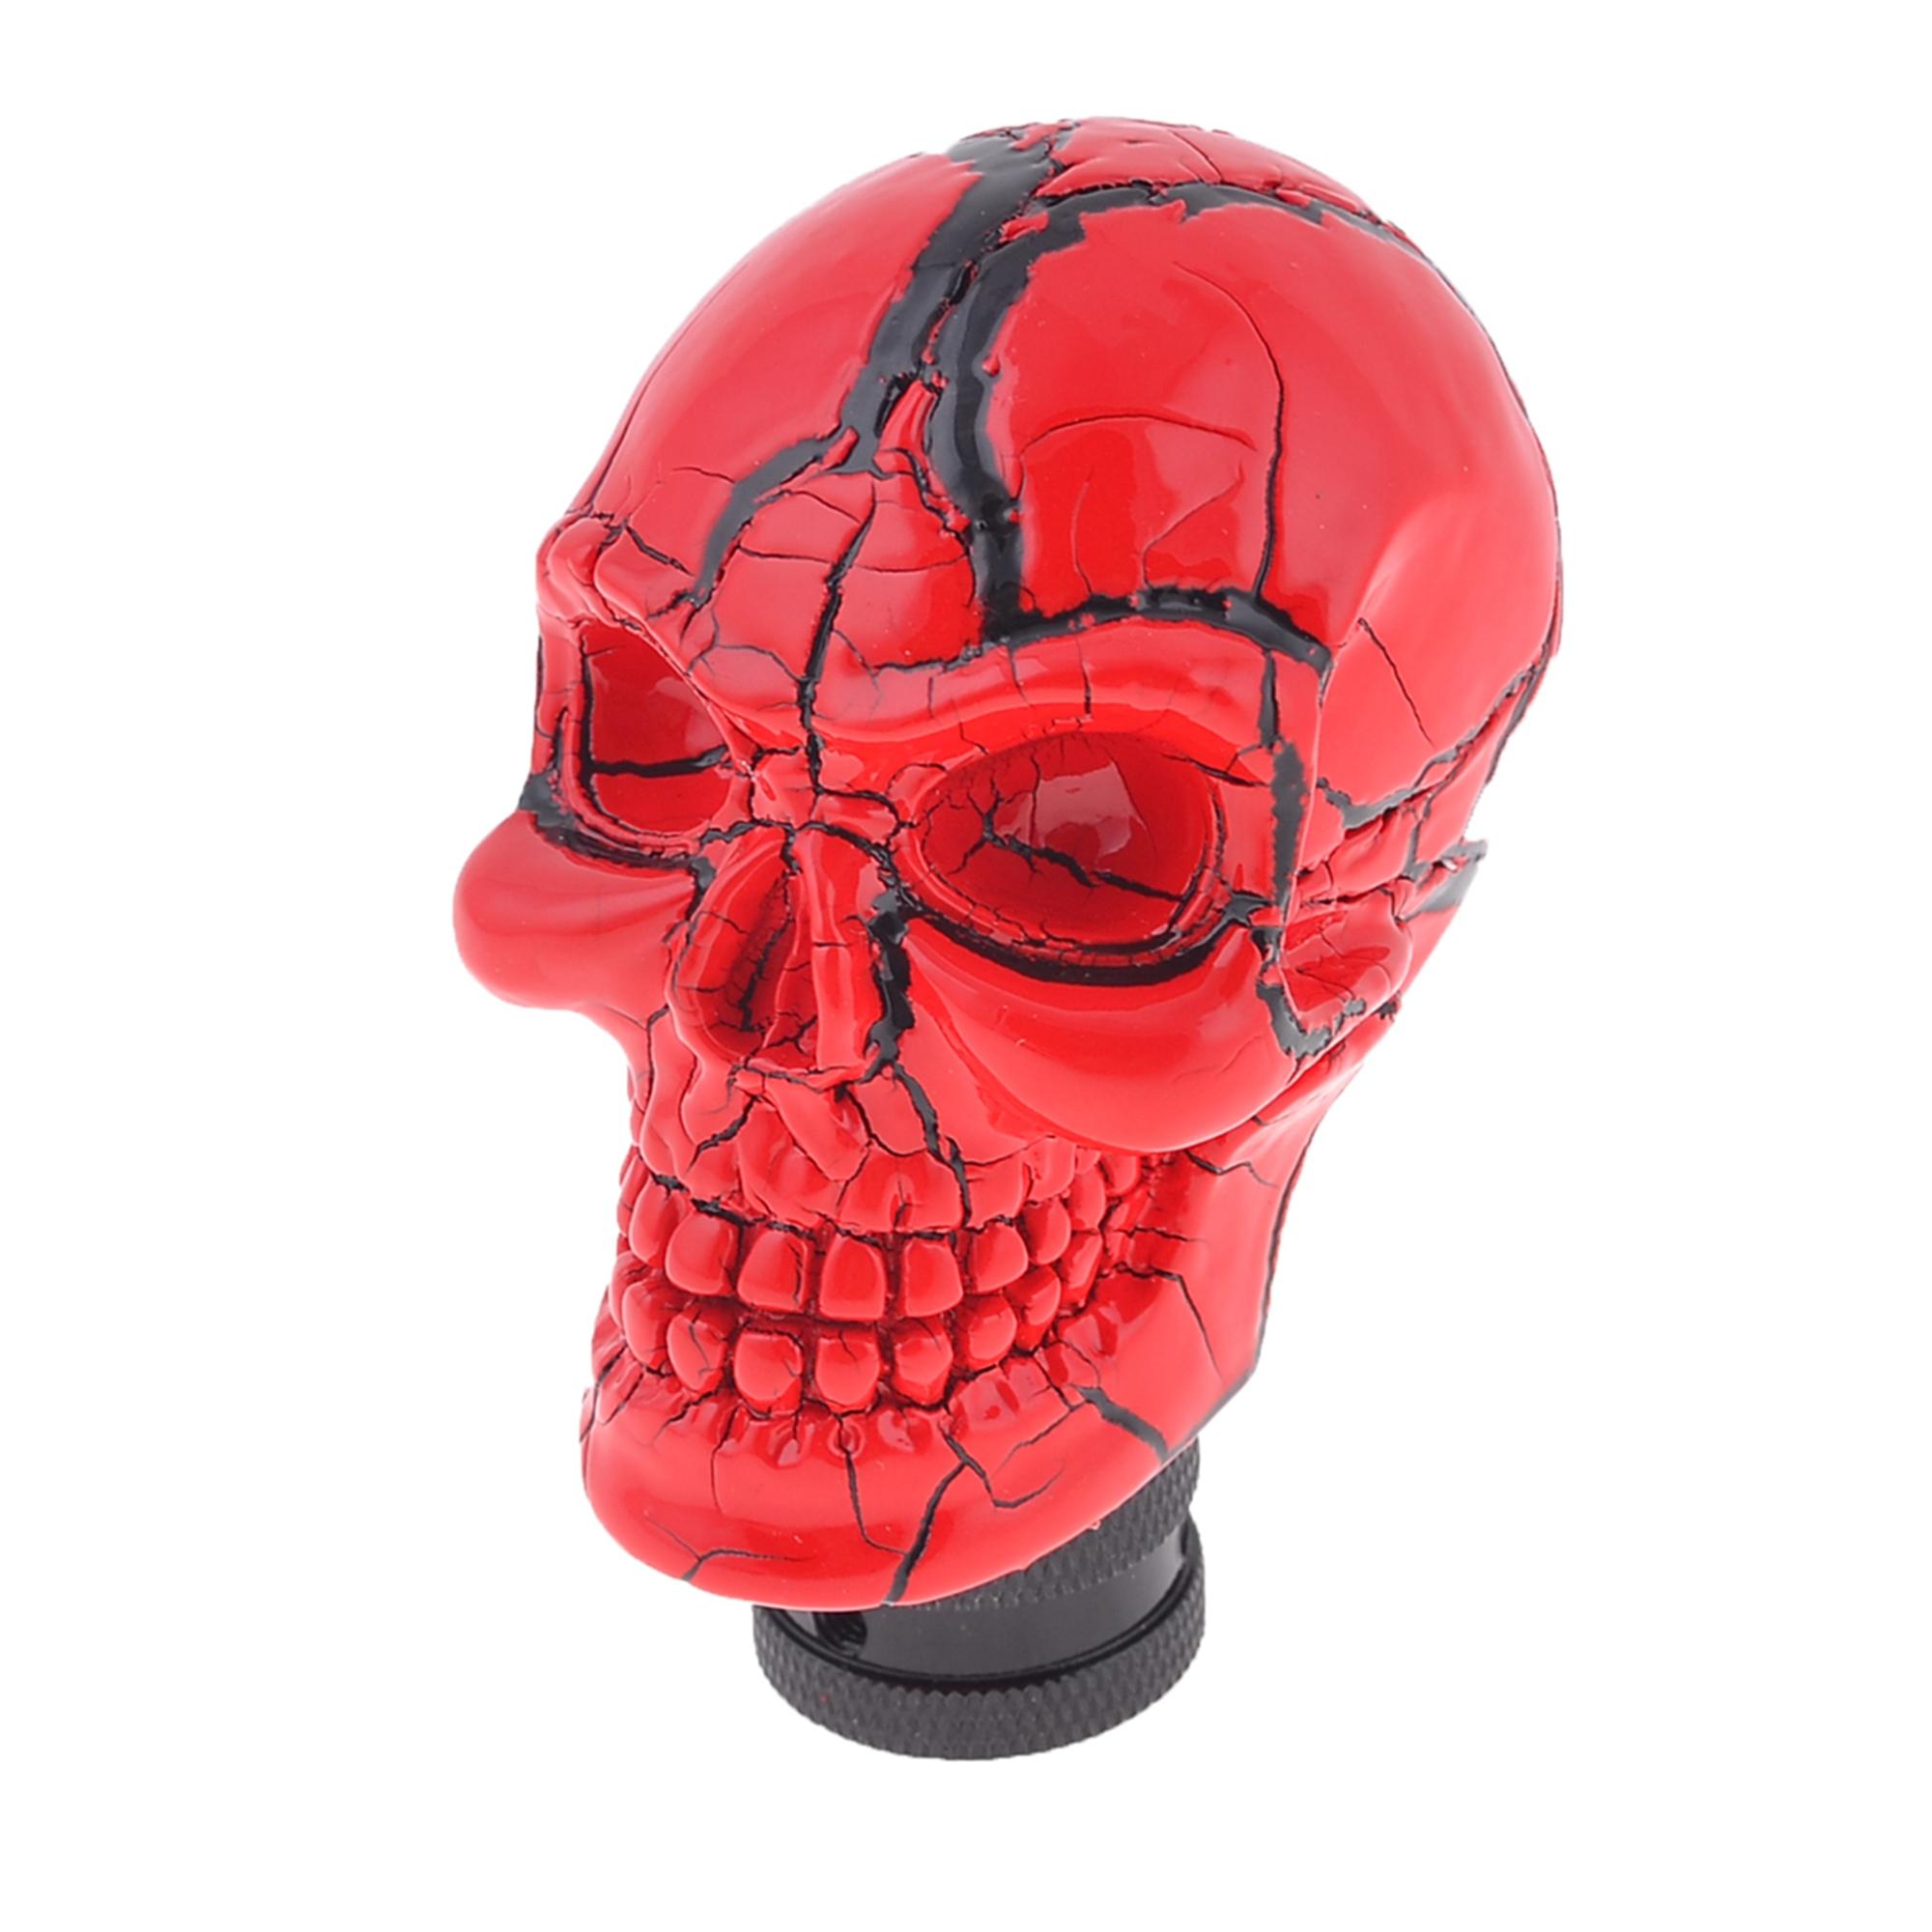 Car Truck Cracked Skull Head Shape Shift Gear Shifter Knob Cover Red